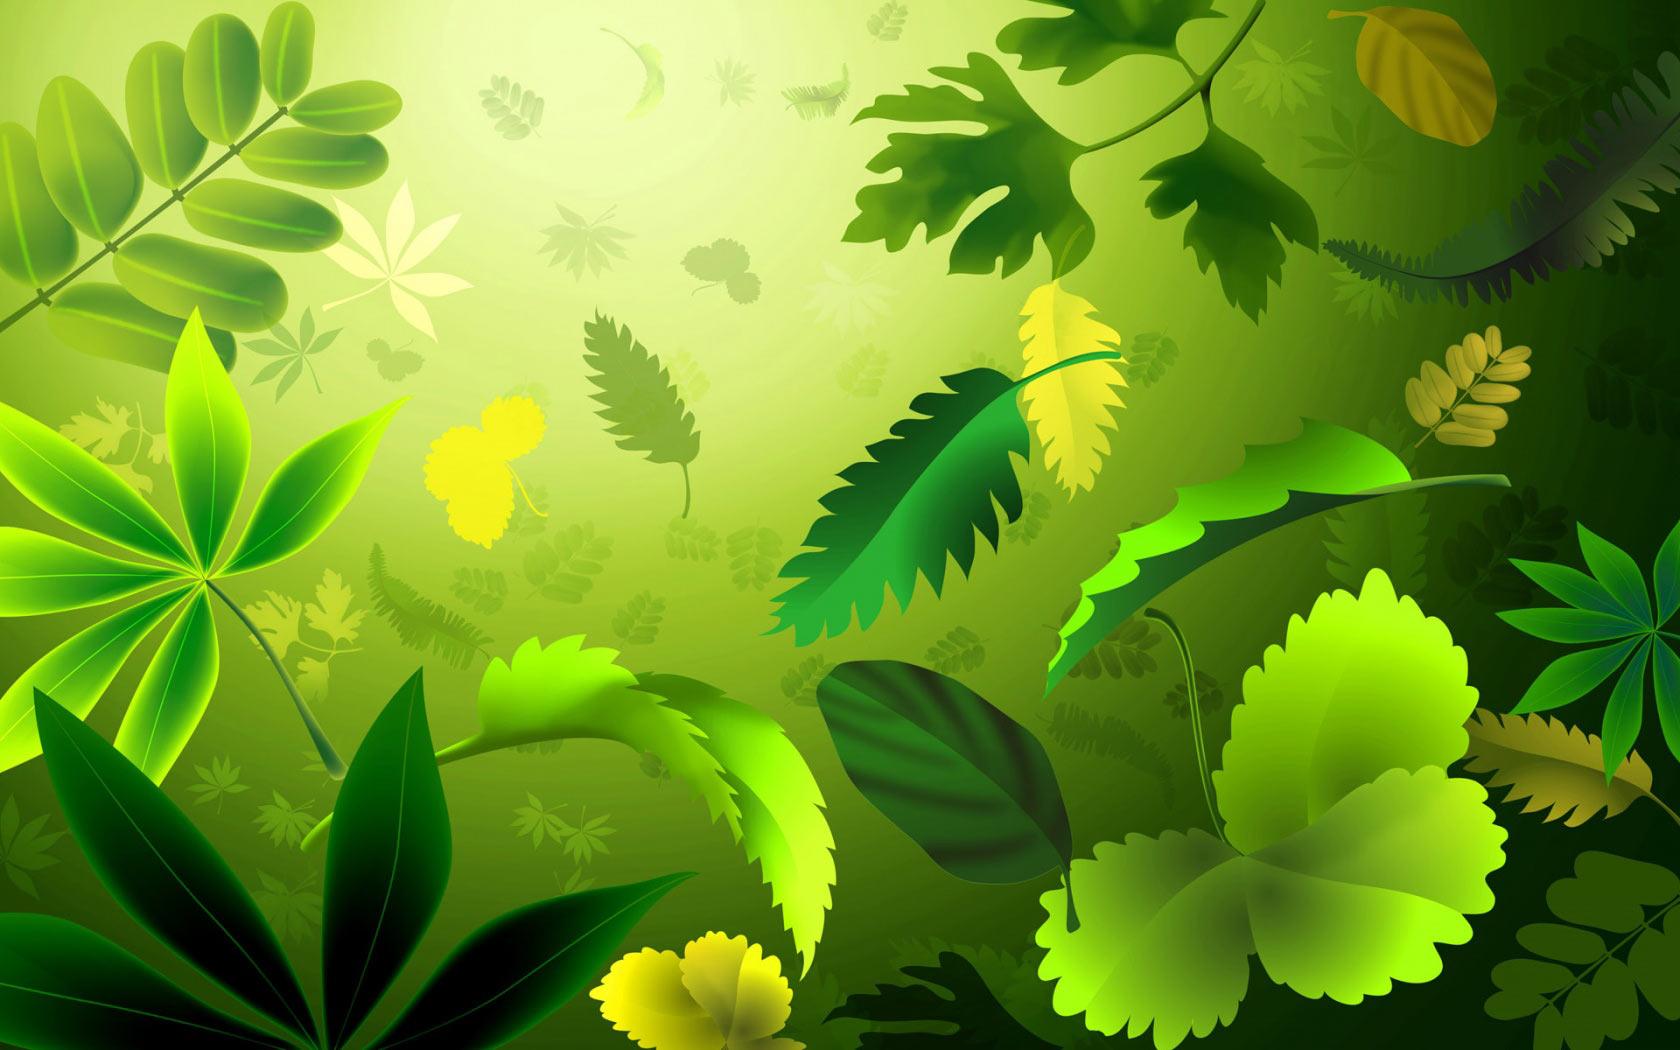 Nature 3d Clipart Download.